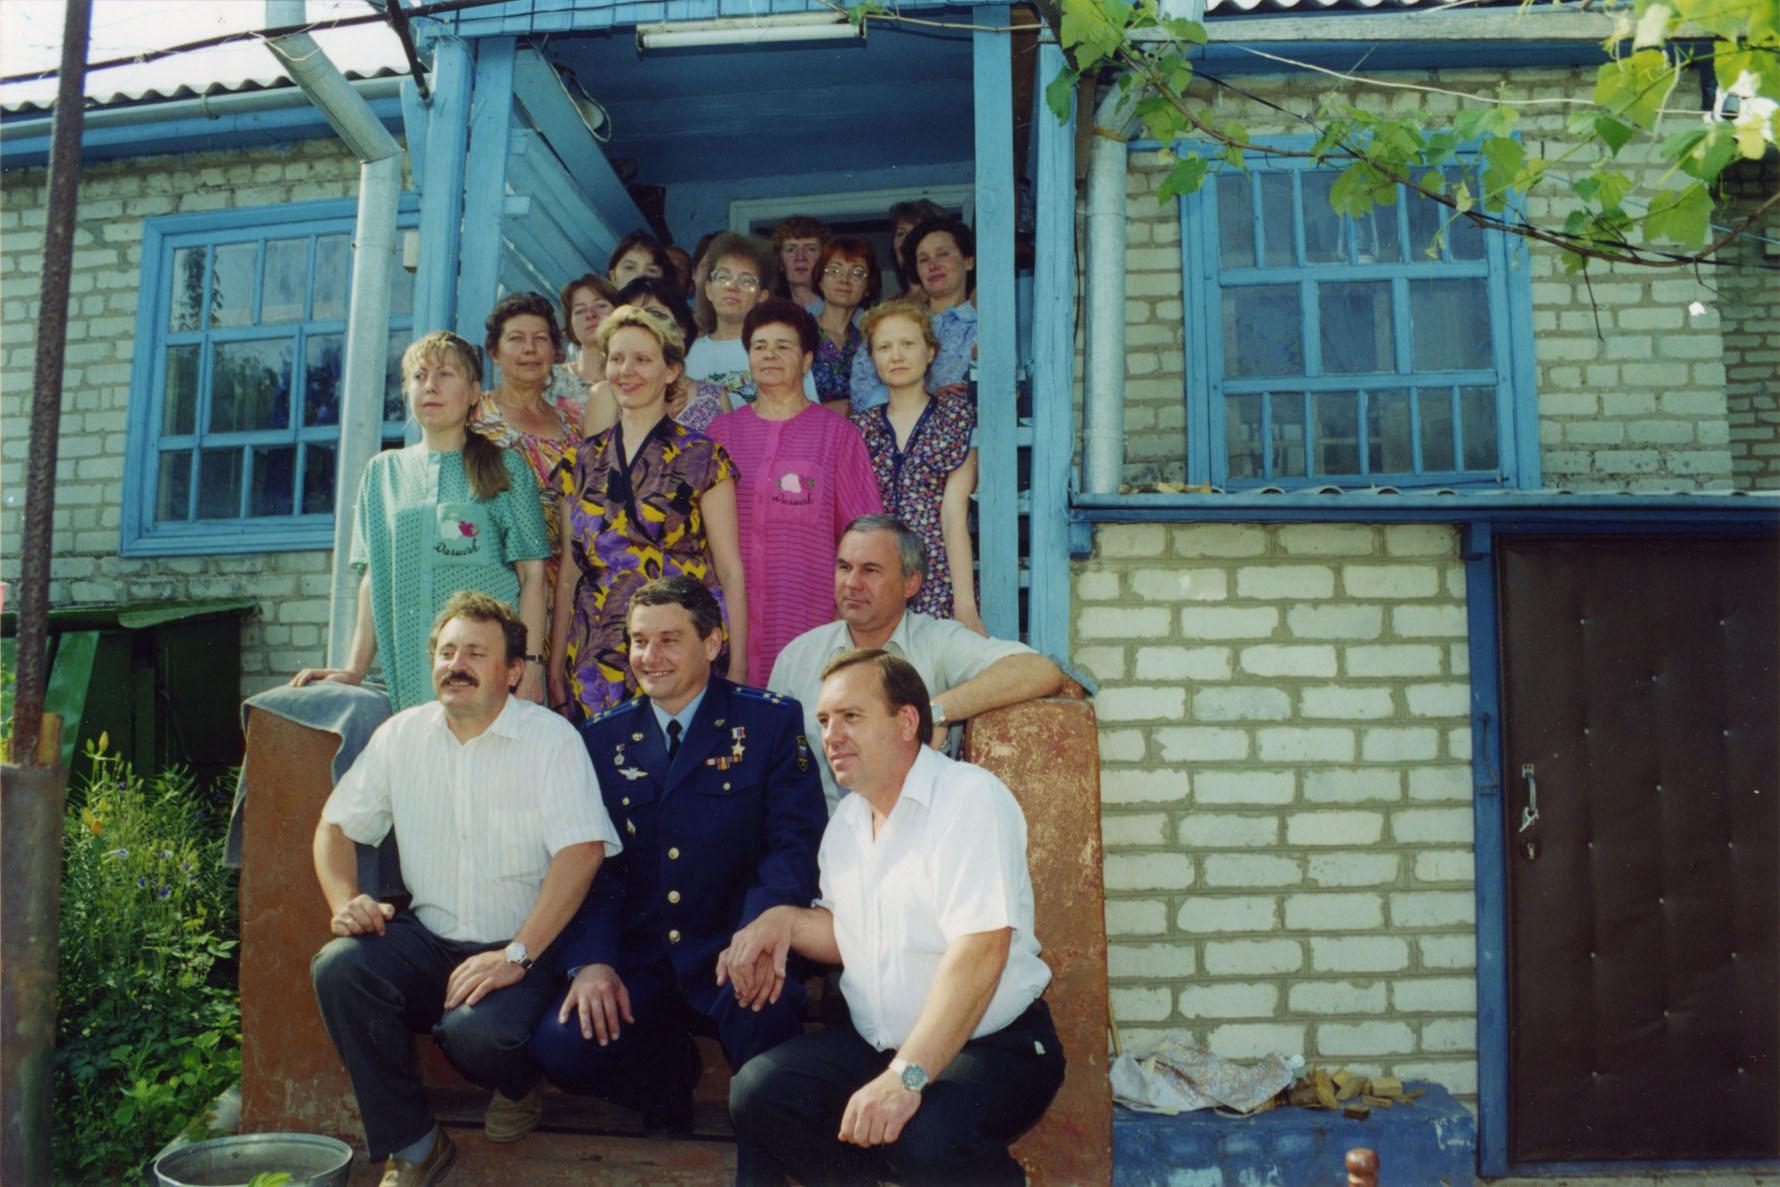 Космонавты возле дома 1997г.jpg